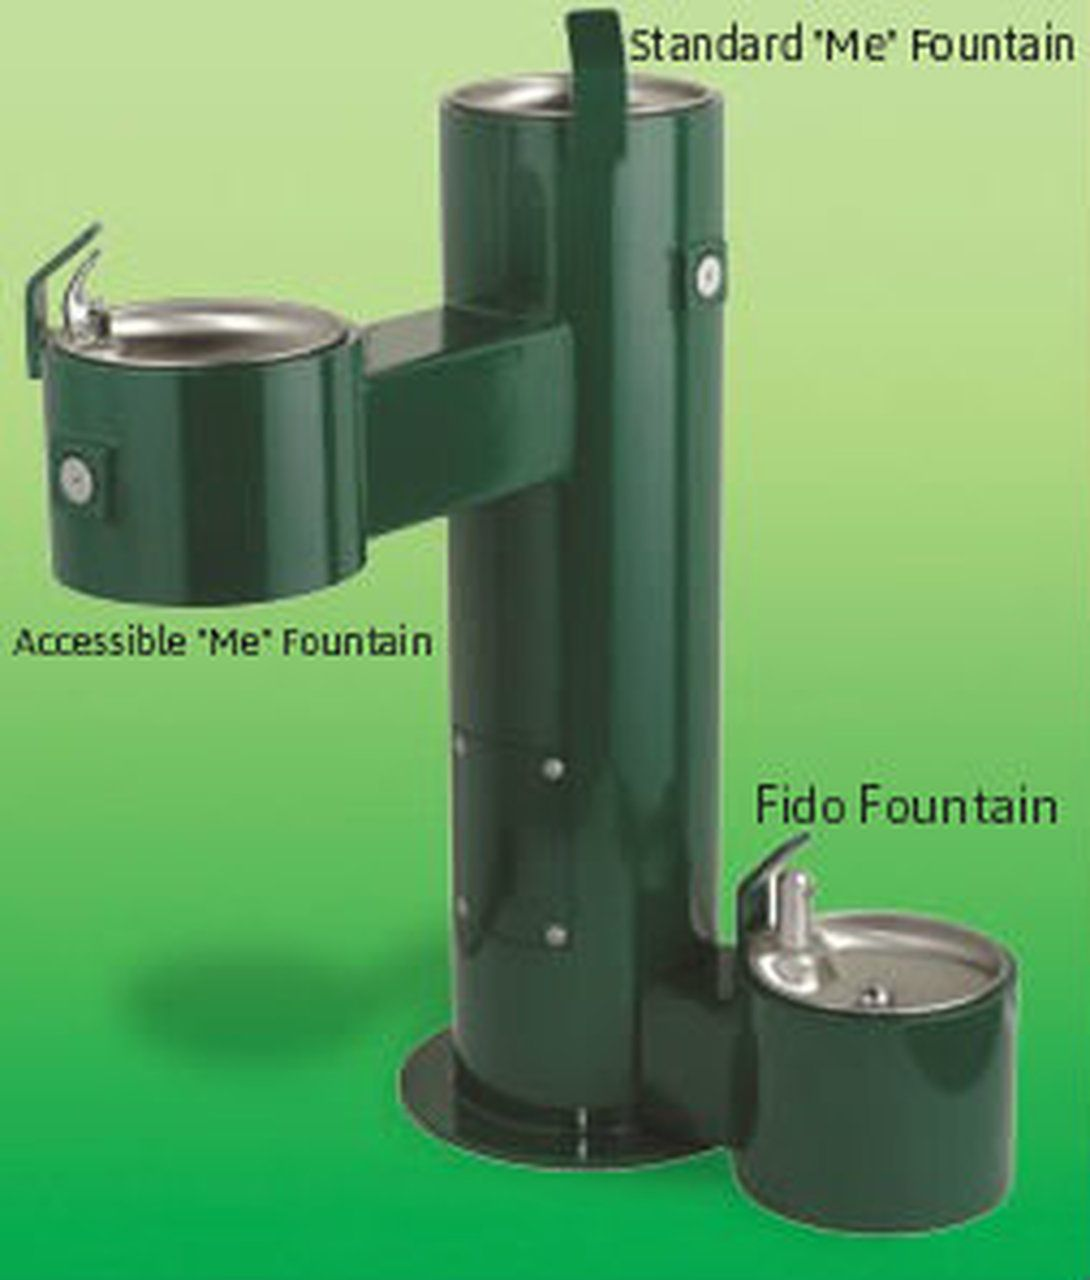 Barkpark fido me fountain with accessible basin basin